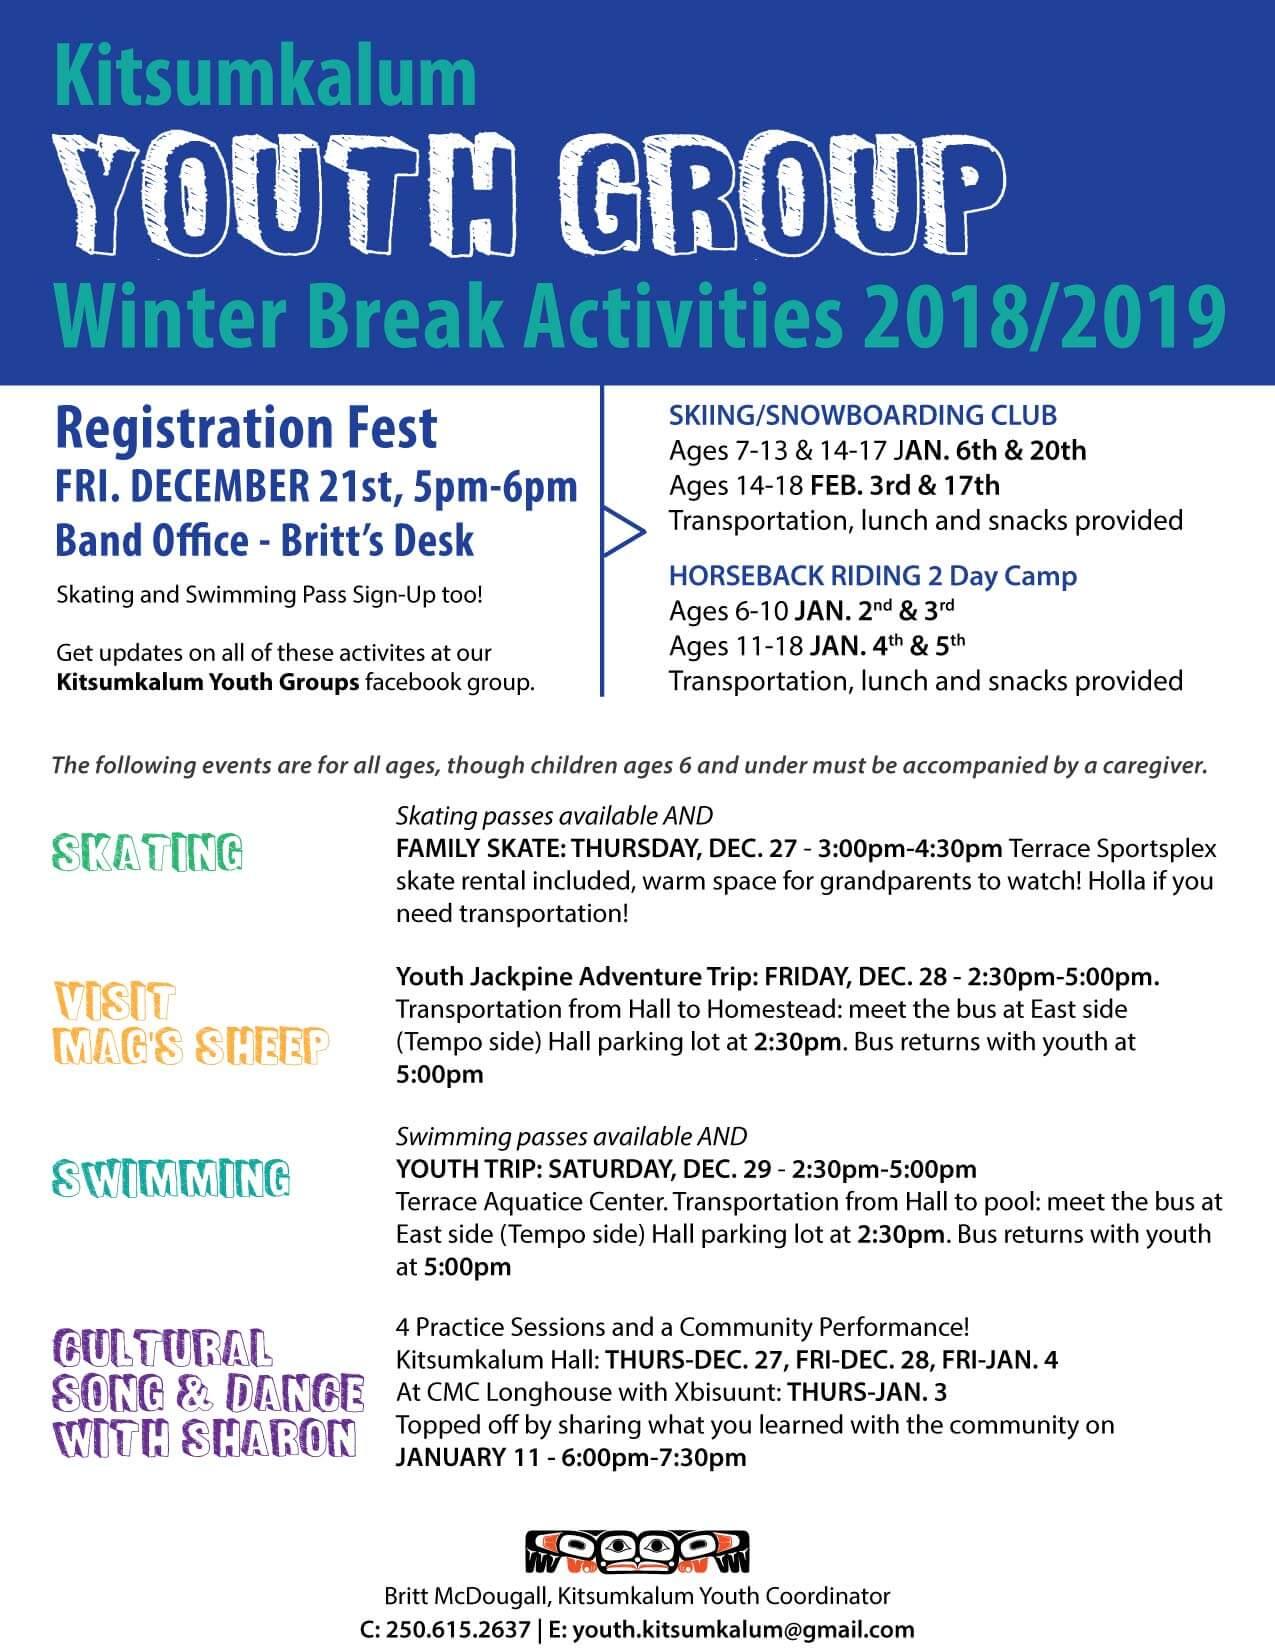 Winter Break Activities for Kitsumkalum Youth 2018/2019